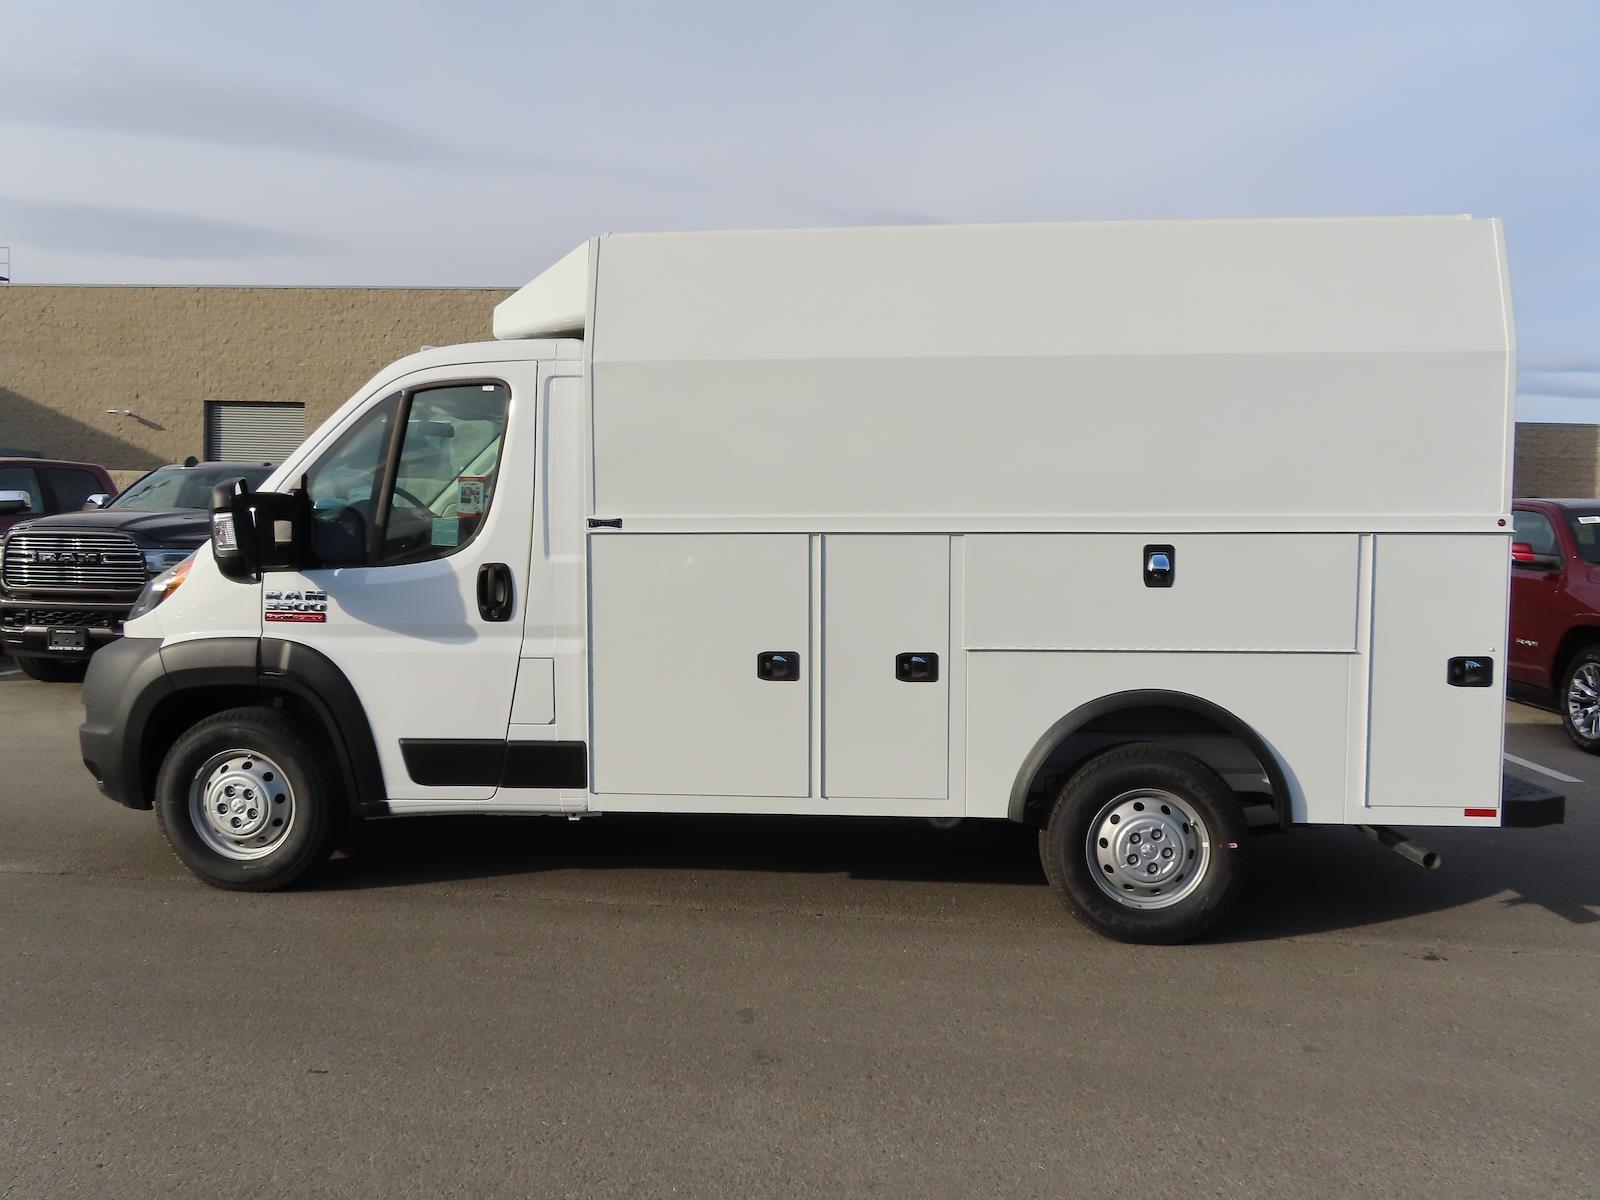 2020 Ram ProMaster 3500 FWD, Knapheide Service Utility Van #XPRO4974 - photo 1